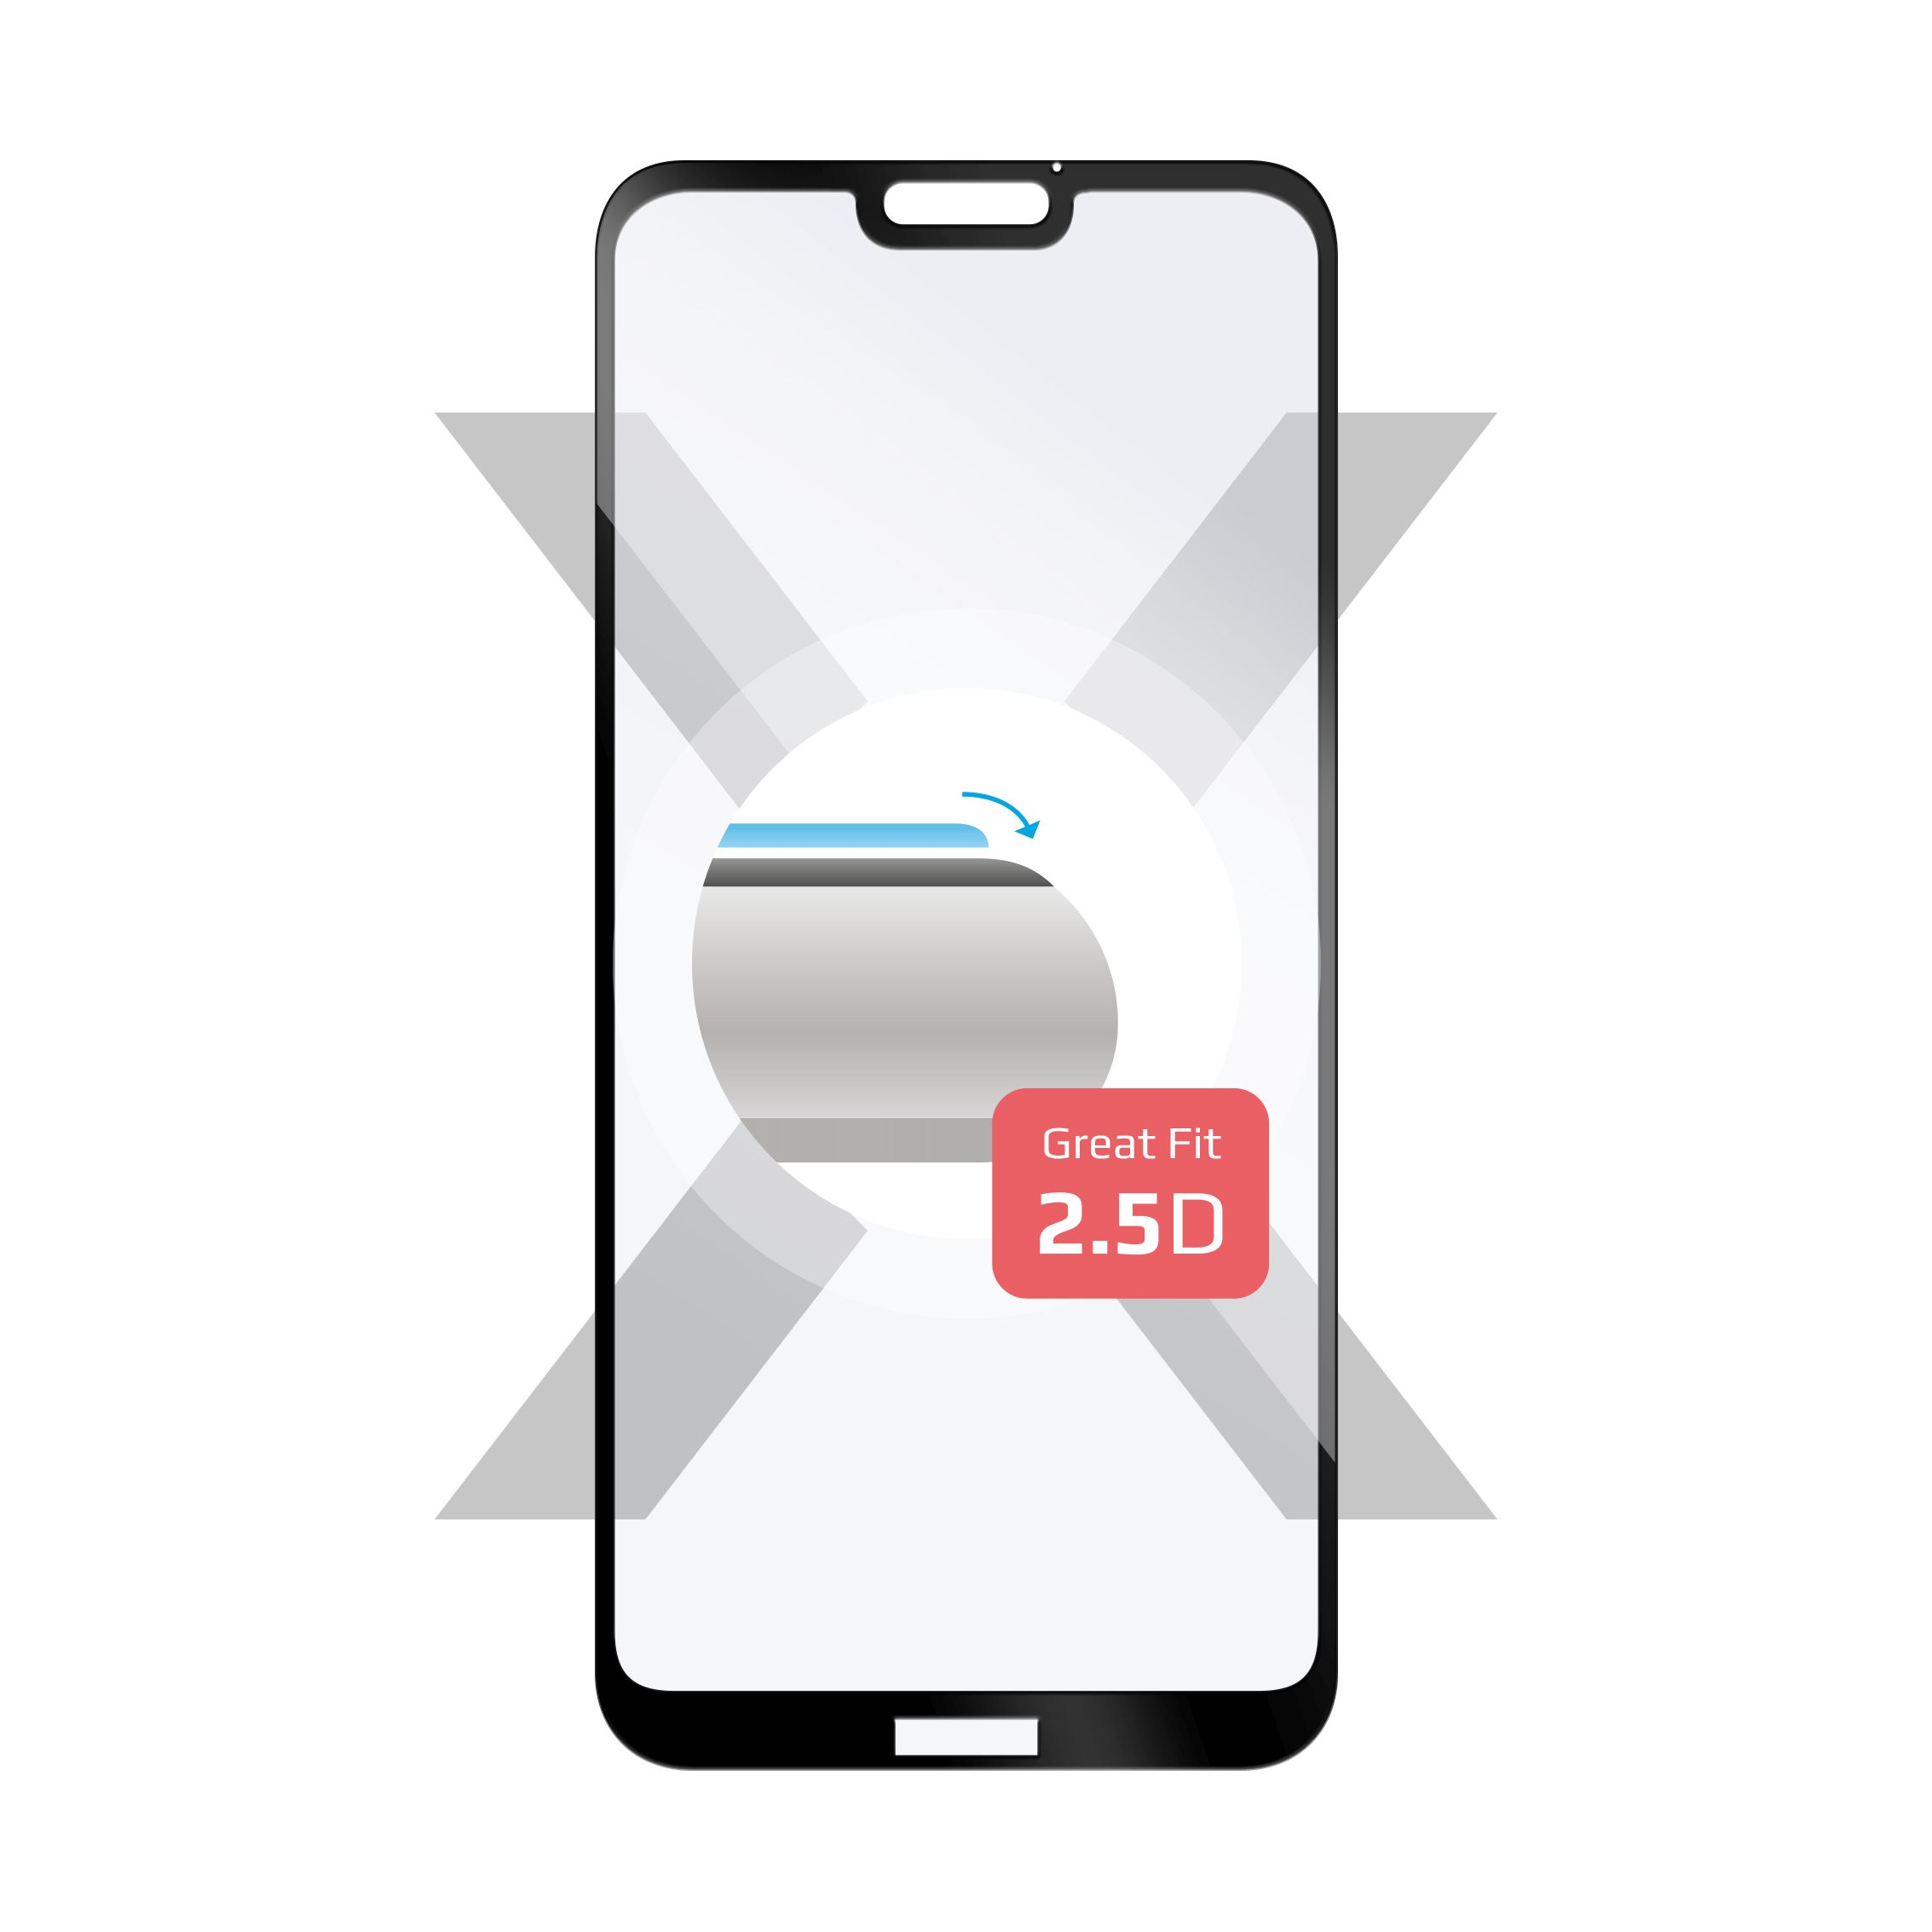 Ochranné tvrzené sklo FIXED Full-Cover pro Huawei P20 Lite, přes celý displej, černé, 0.33 mm